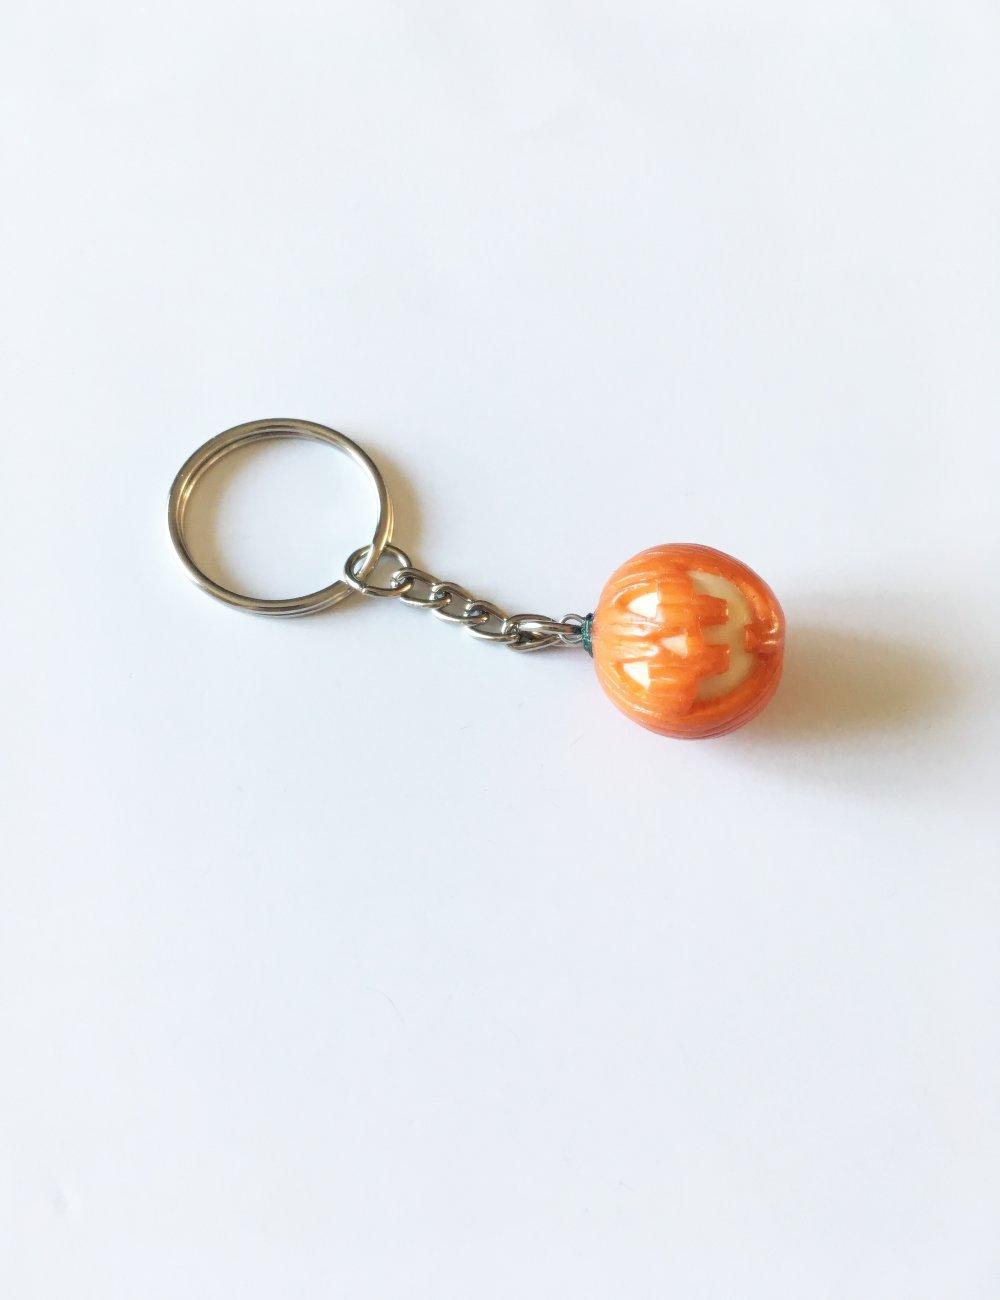 Porte-clés Fimo Halloween tête de citrouille phosphorescente